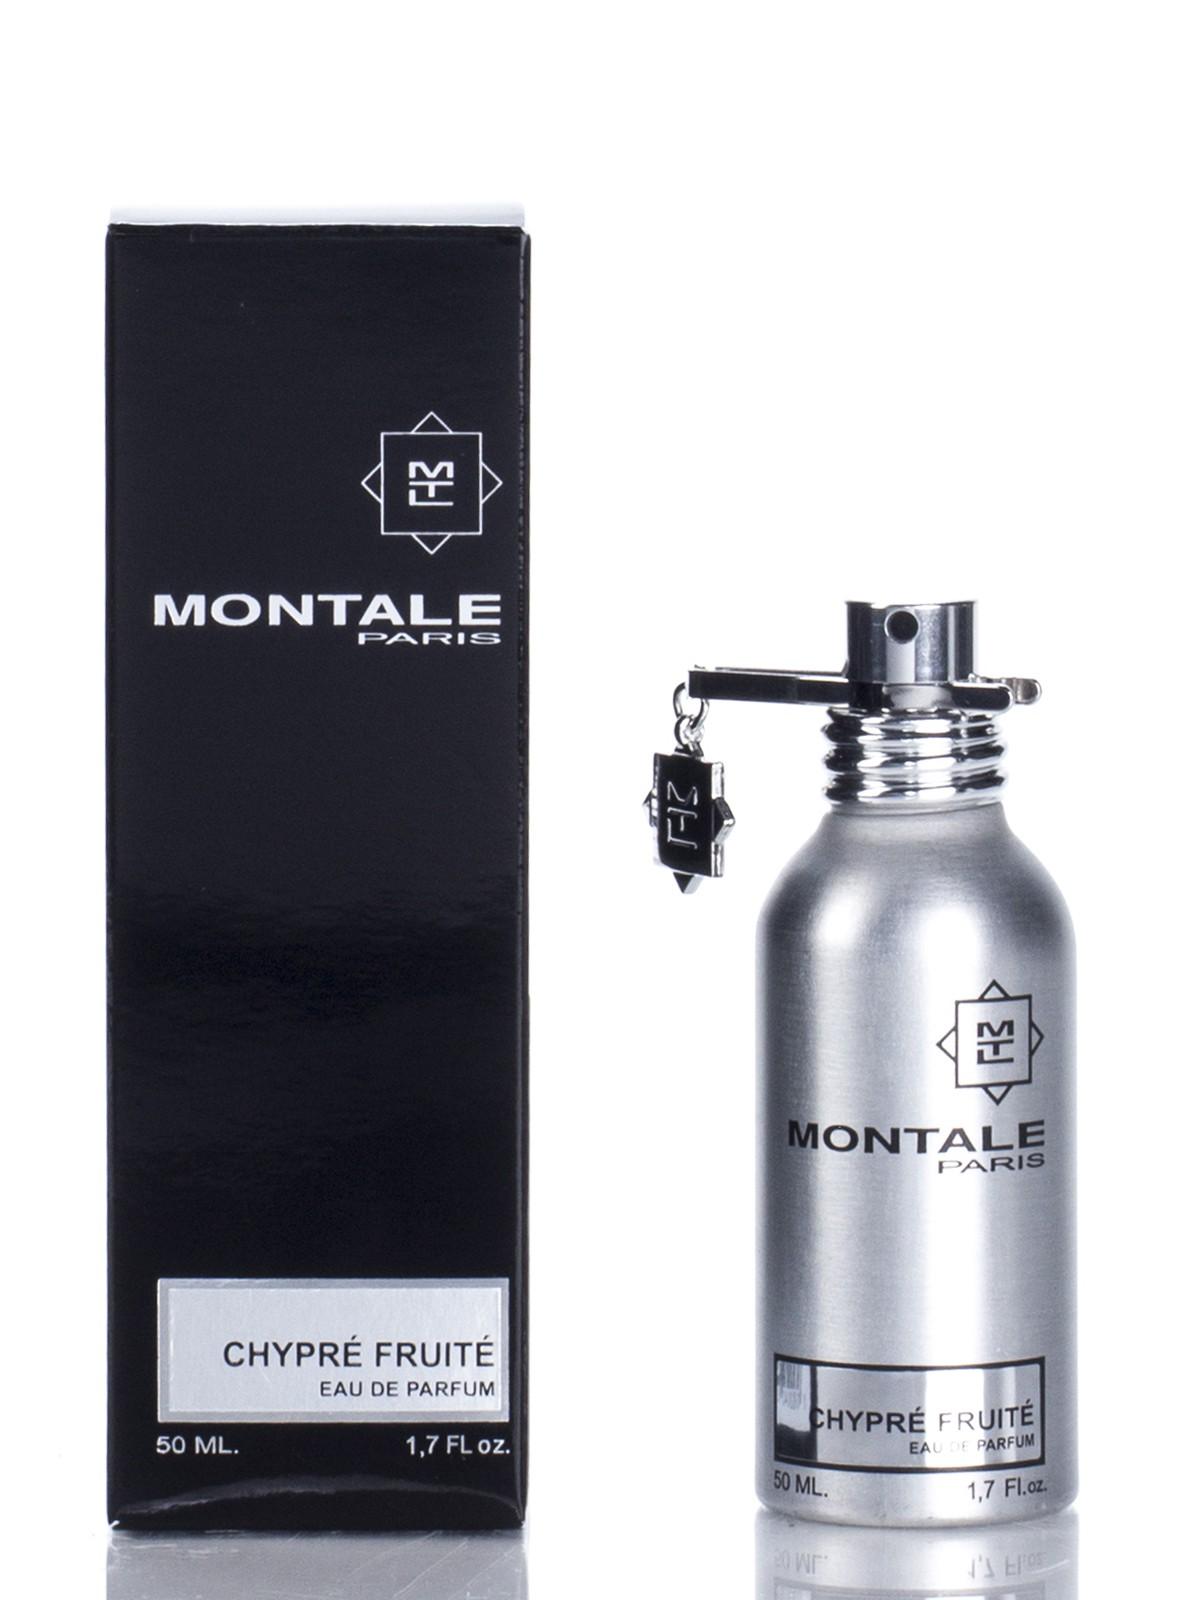 Montale Chypre Fruite 50ml edp